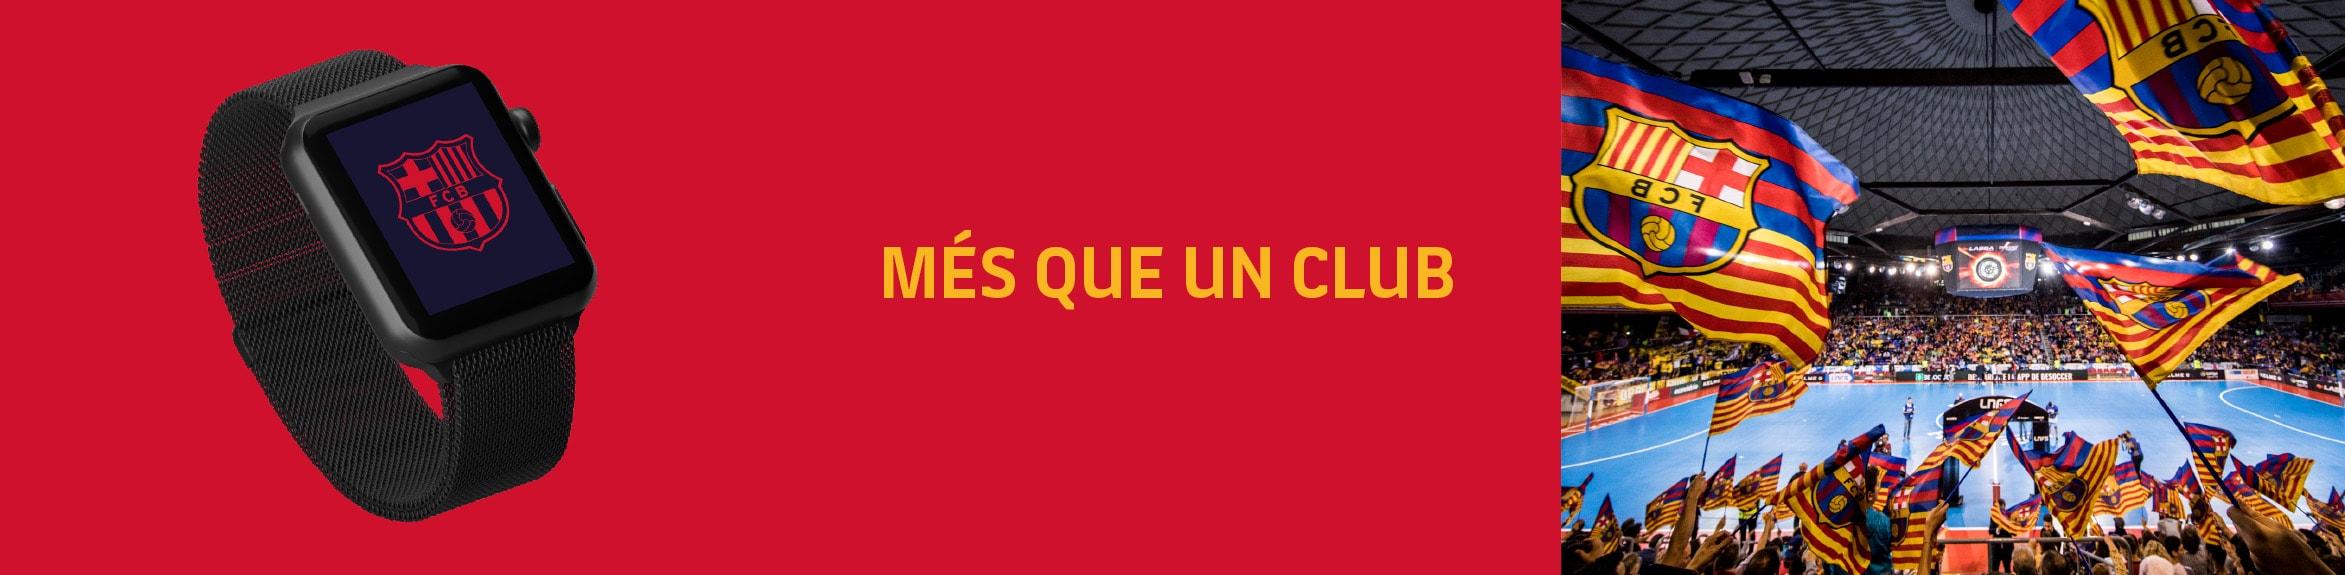 mes-que-un-club